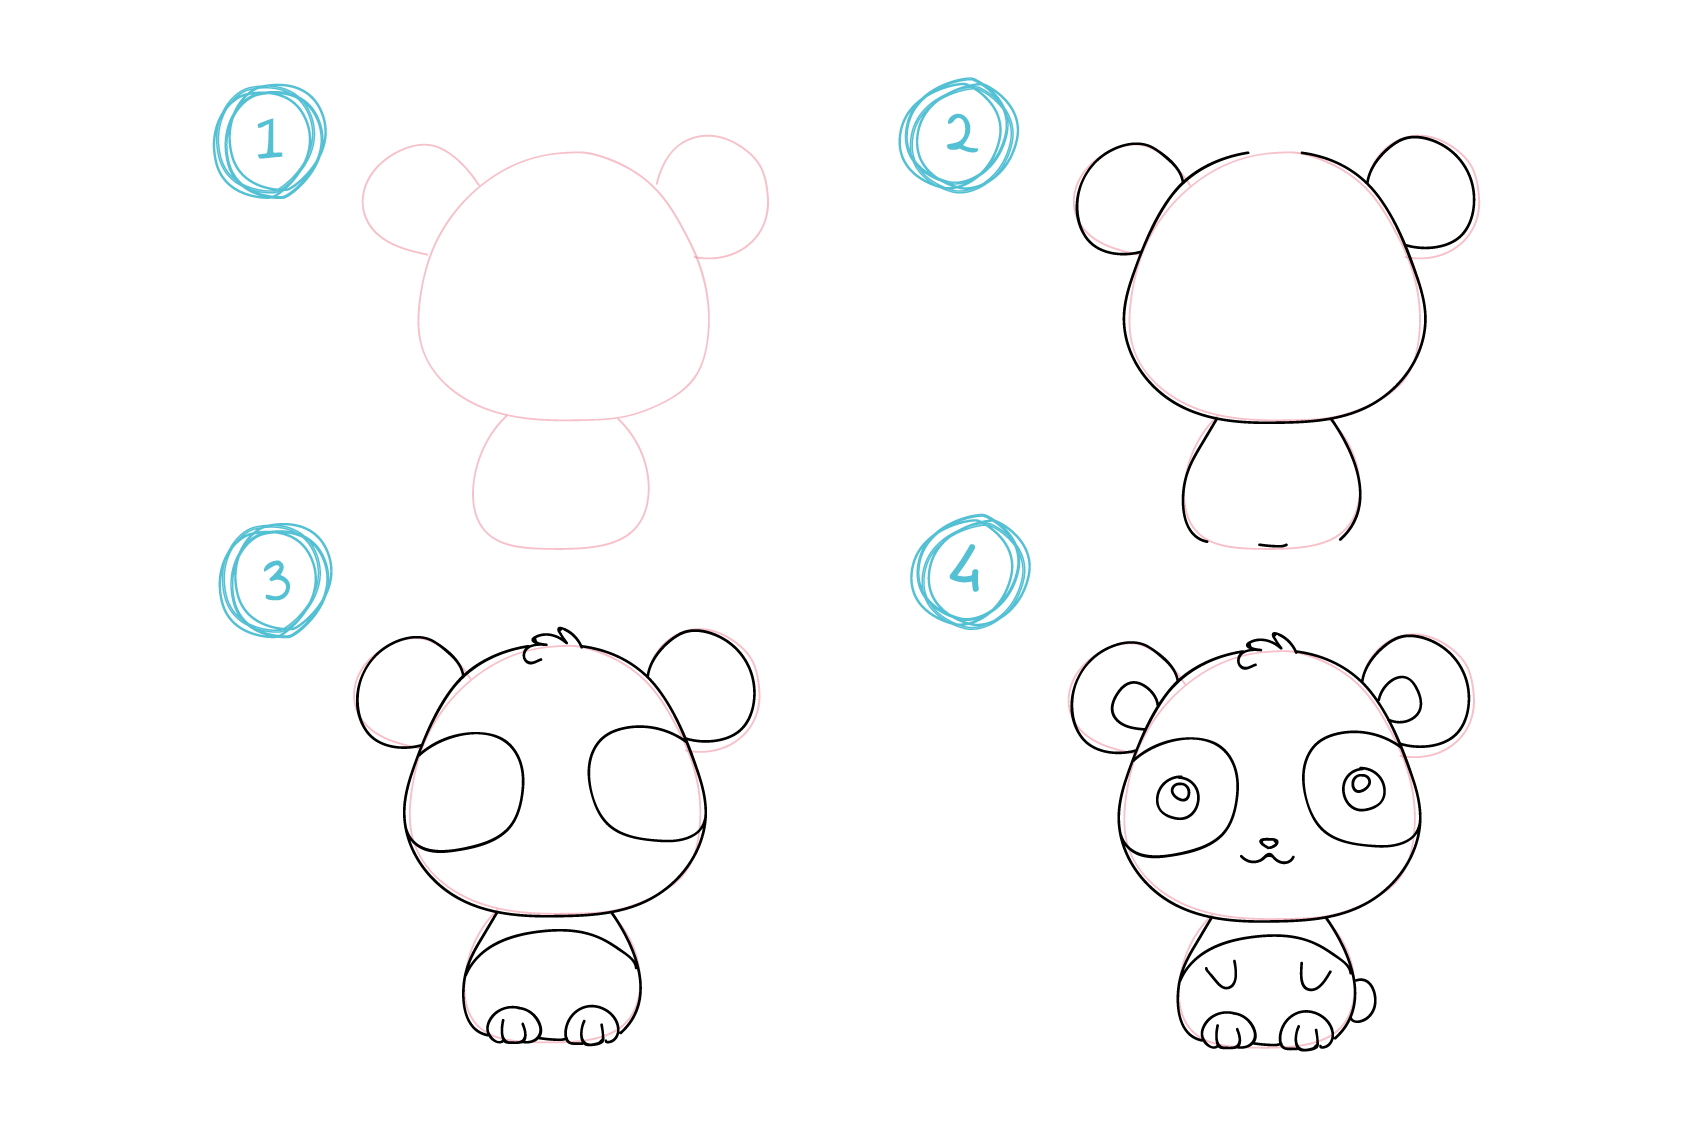 Disegni da colorare per bambini a tema kawaii gatto for Immagini disegni kawaii